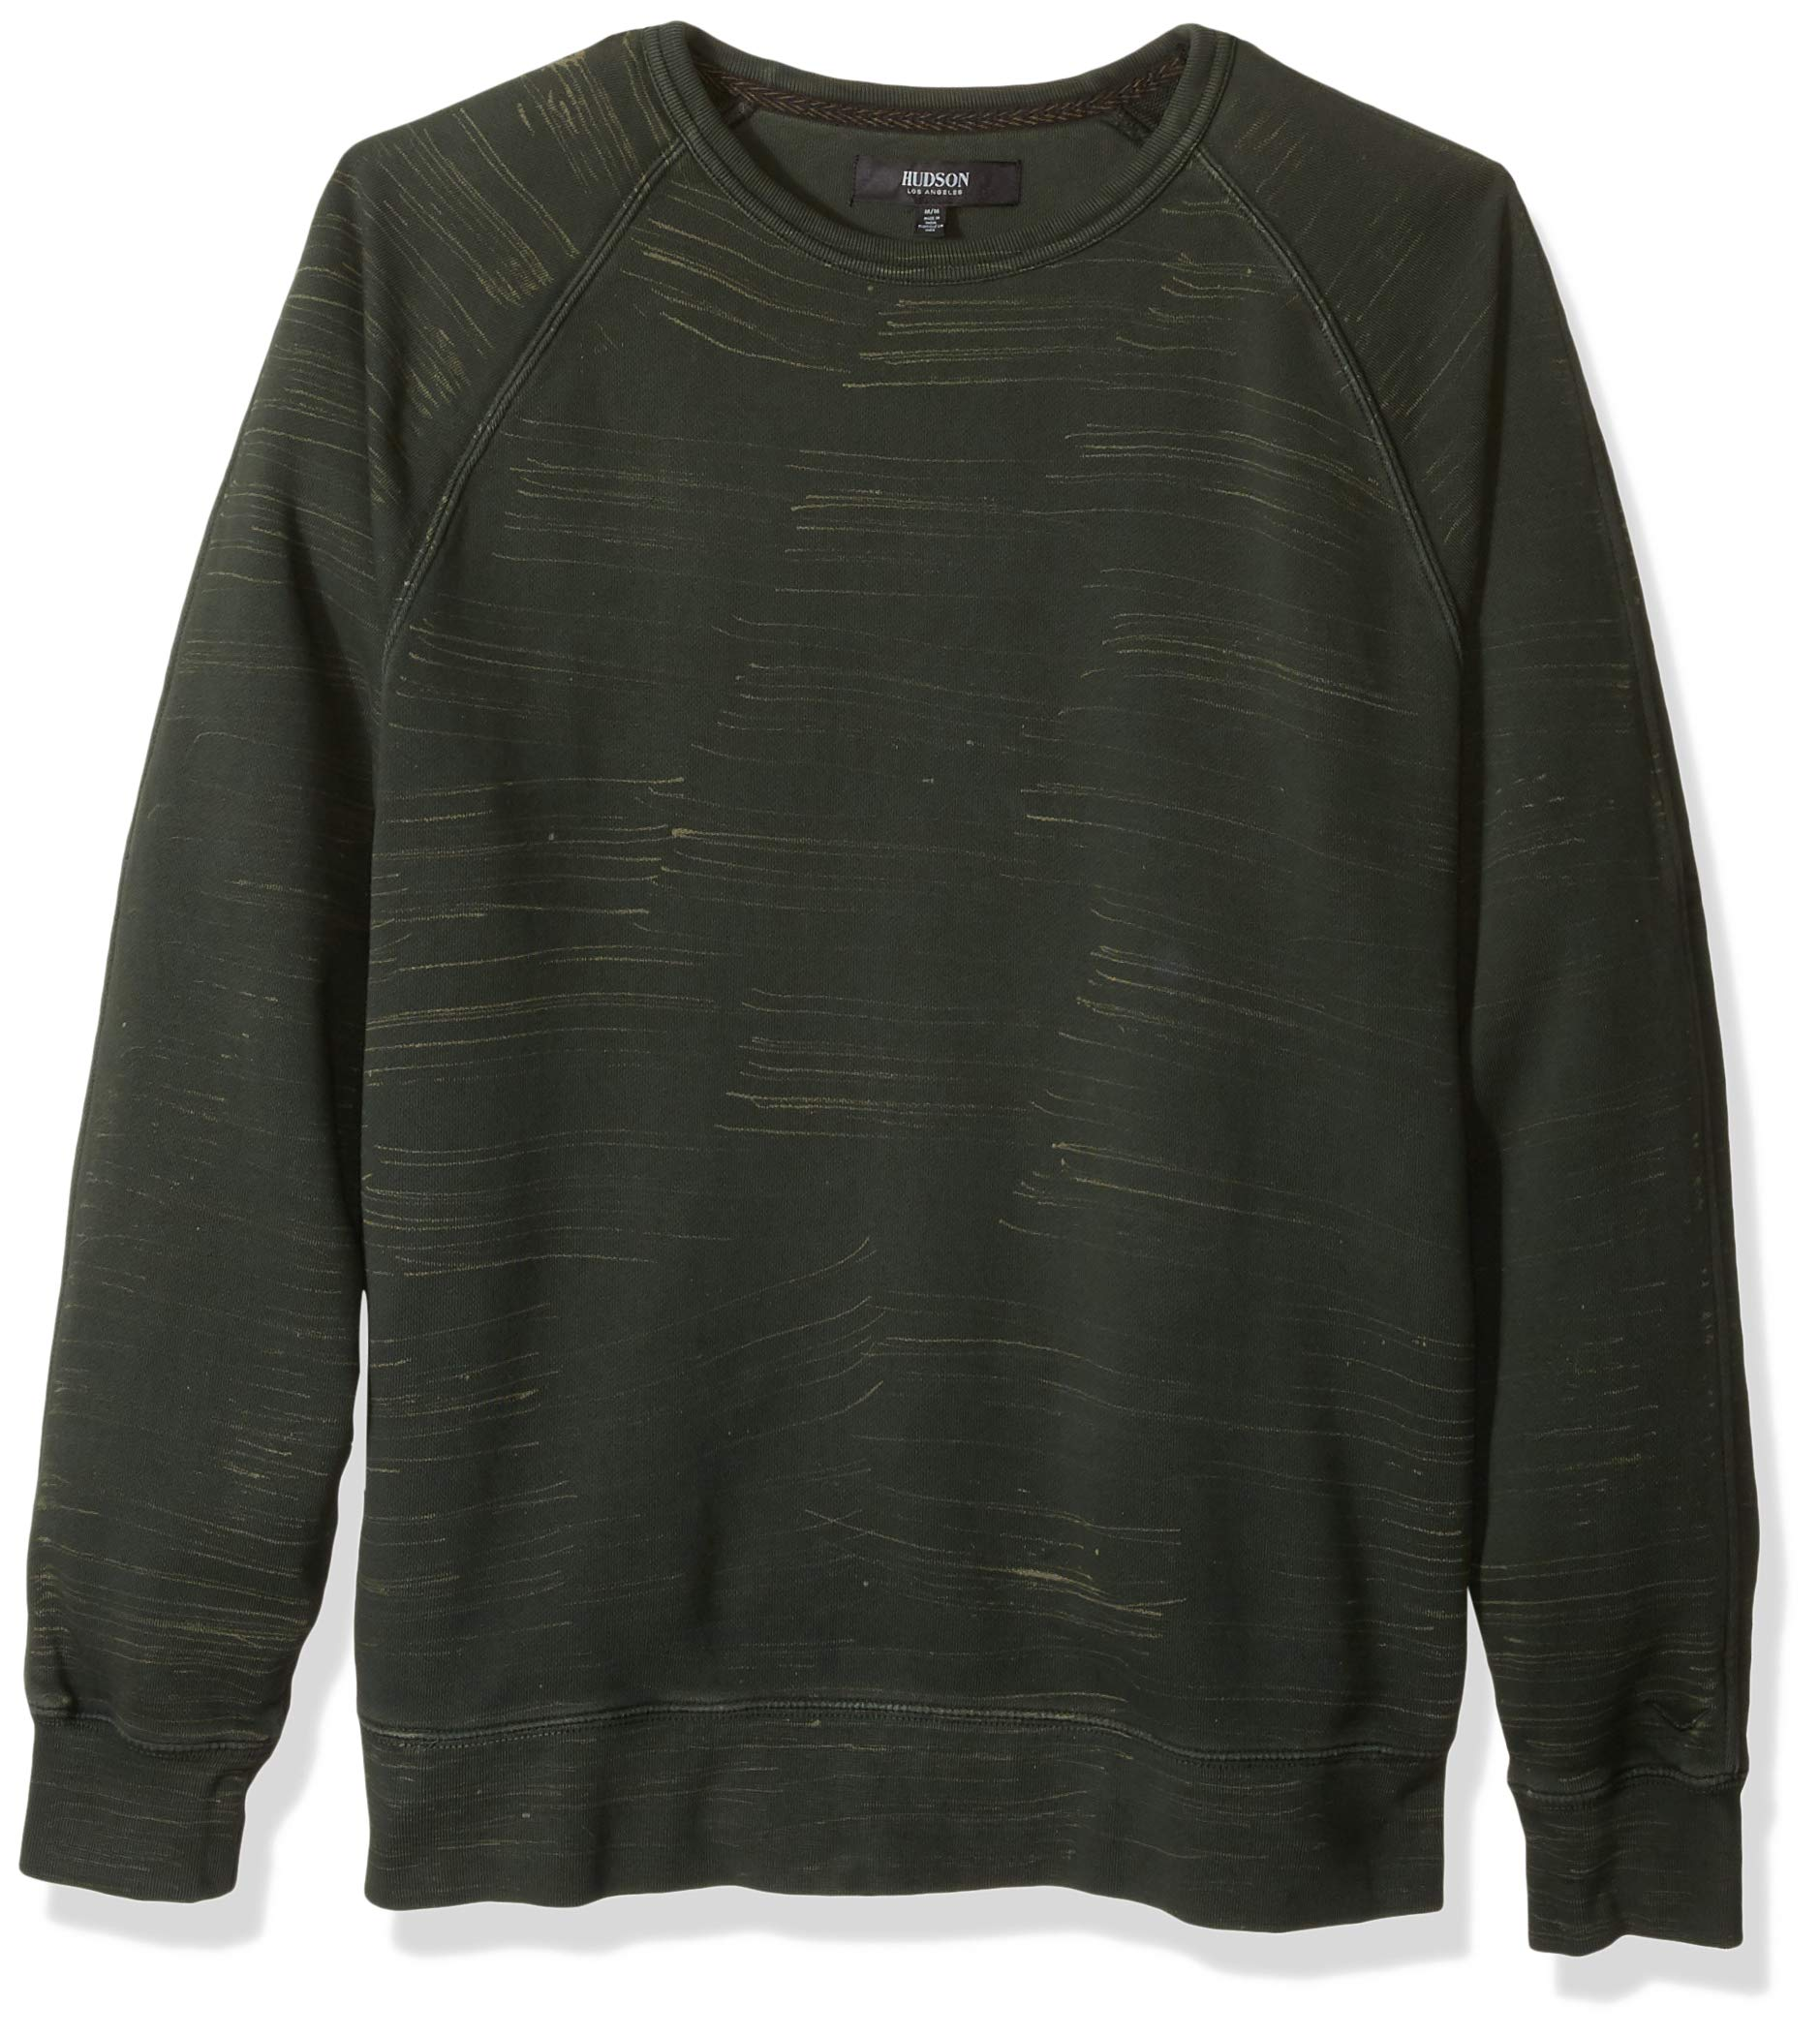 Hudson Jeans Men's Pullover Crewneck Sweater, Pine Marble, M